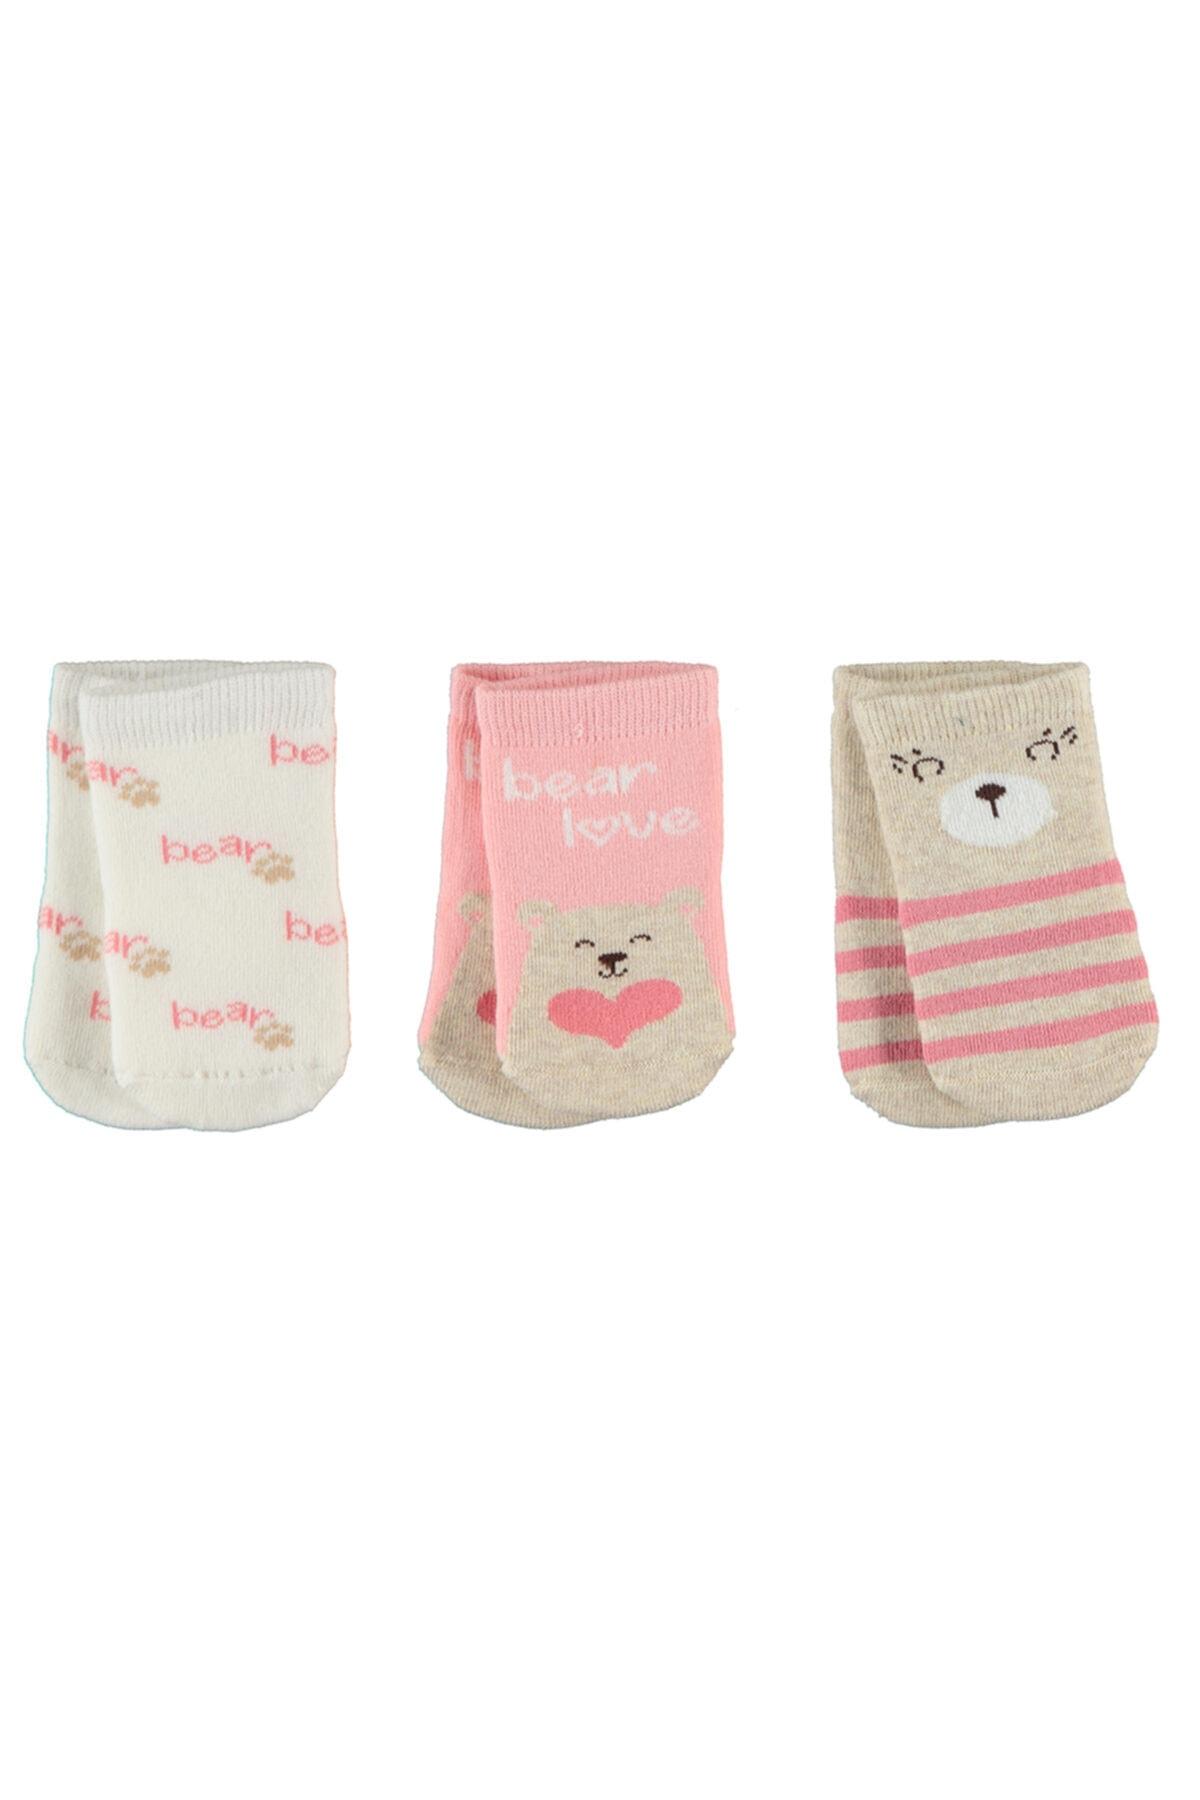 Civil Baby Kız Bebek Havlu 3'lü Çorap Set 0-24 Ay Pudra 1